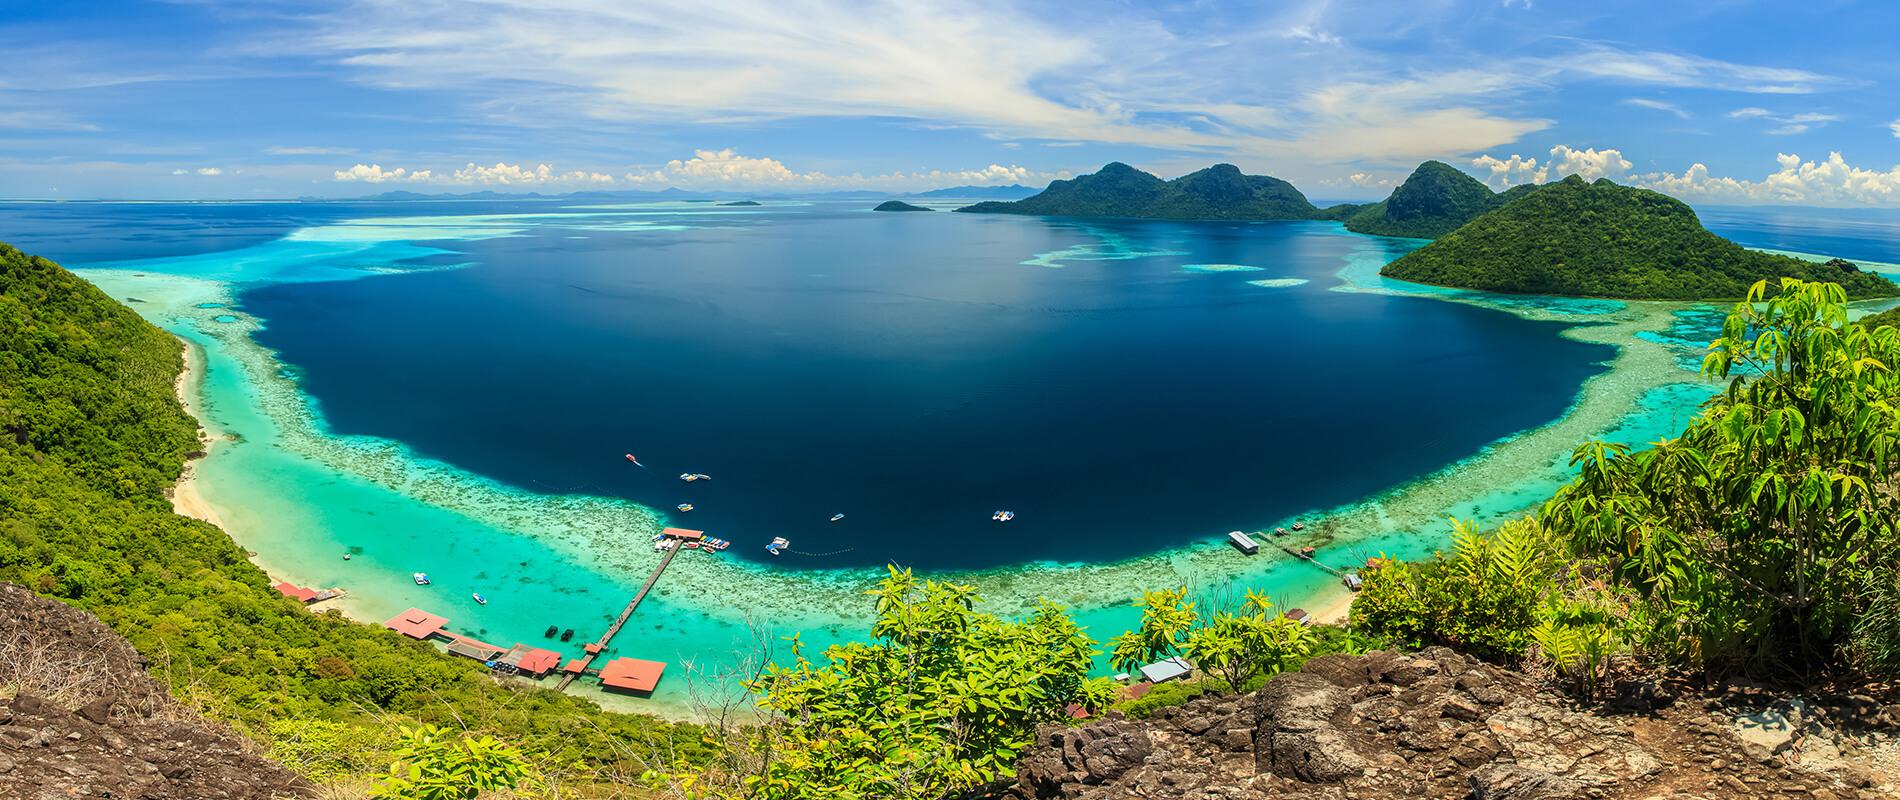 Bohey Dulang, the Island of Wonders